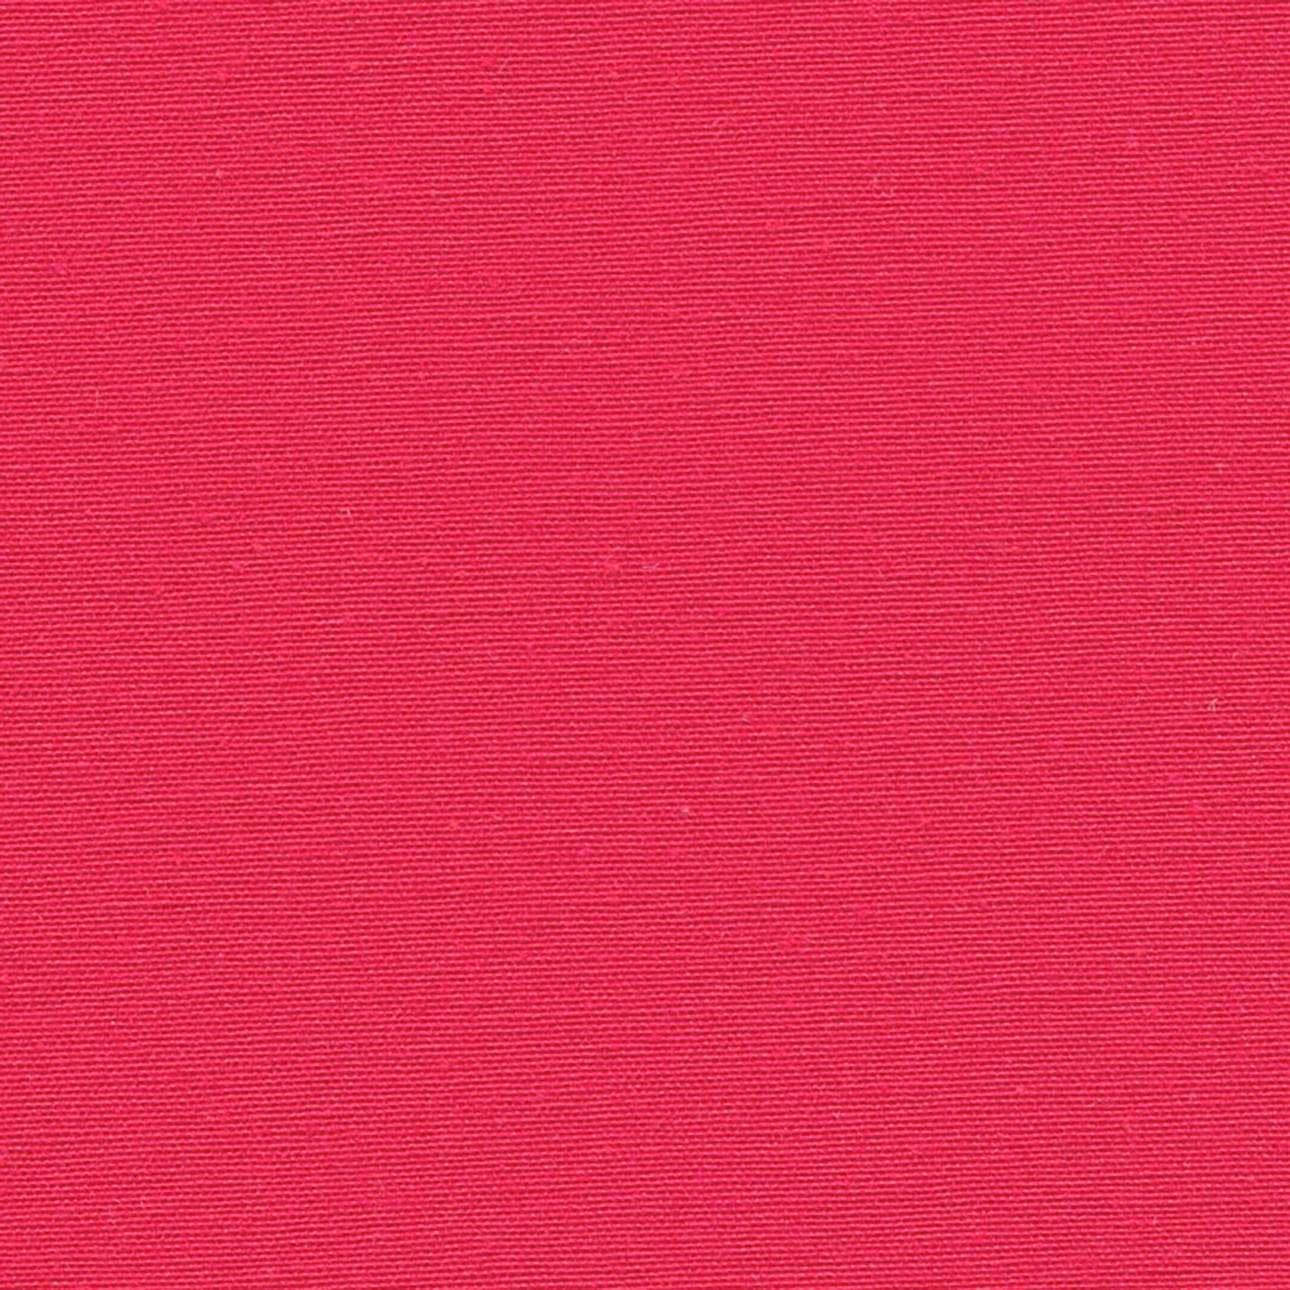 Roleta rzymska Torino 130×170cm w kolekcji Quadro, tkanina: 136-19